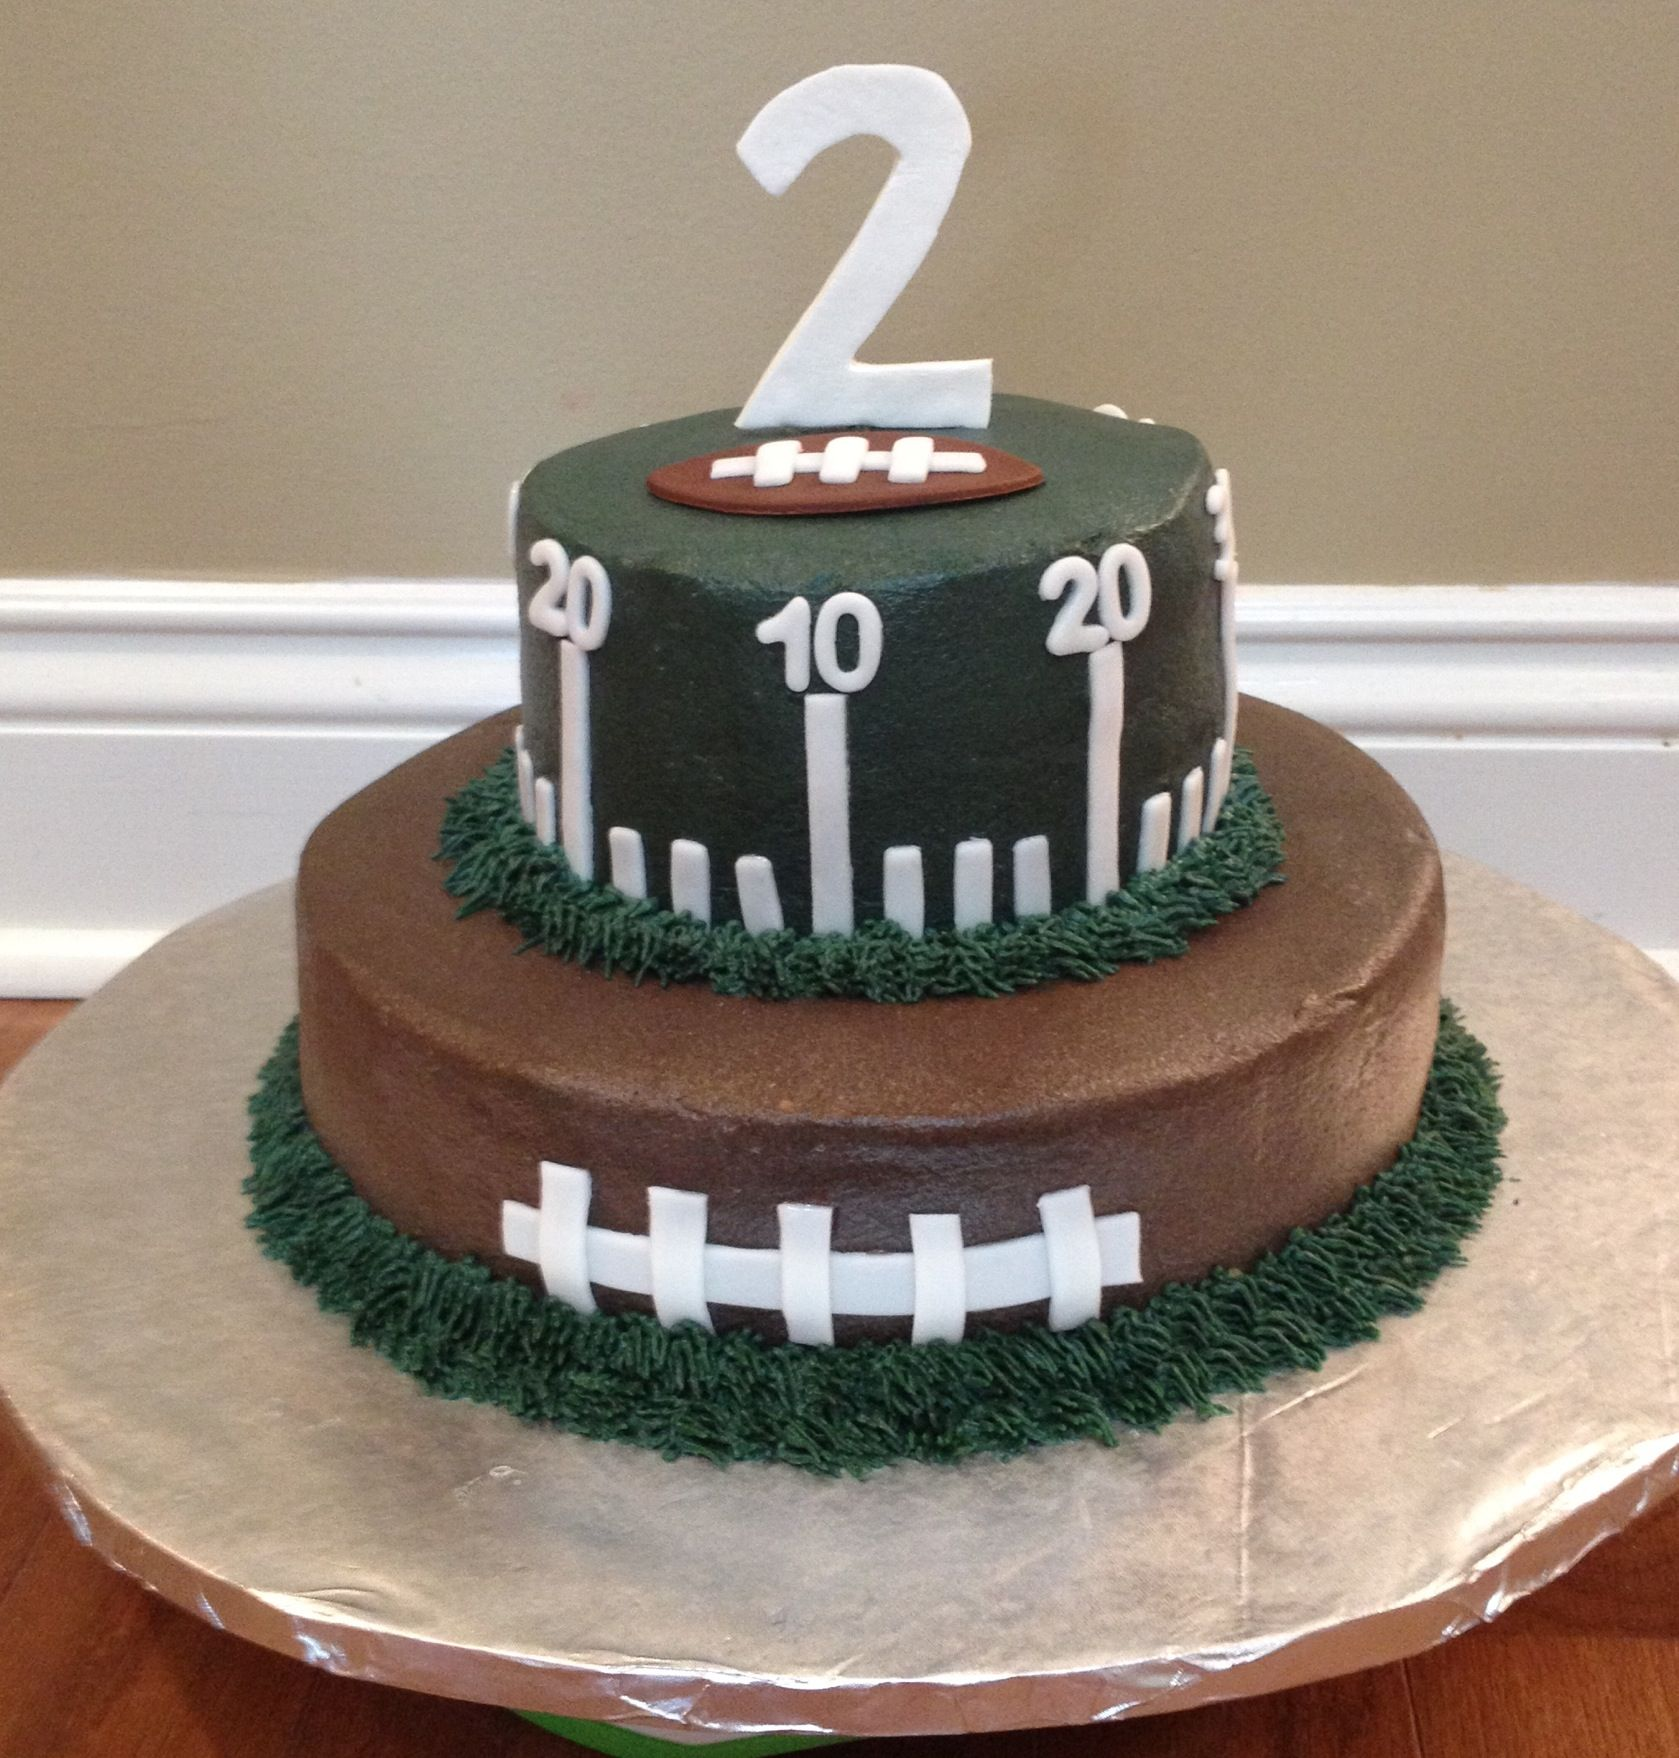 Cake Designs Of Football : Football birthday cake Birthday cakes Pinterest